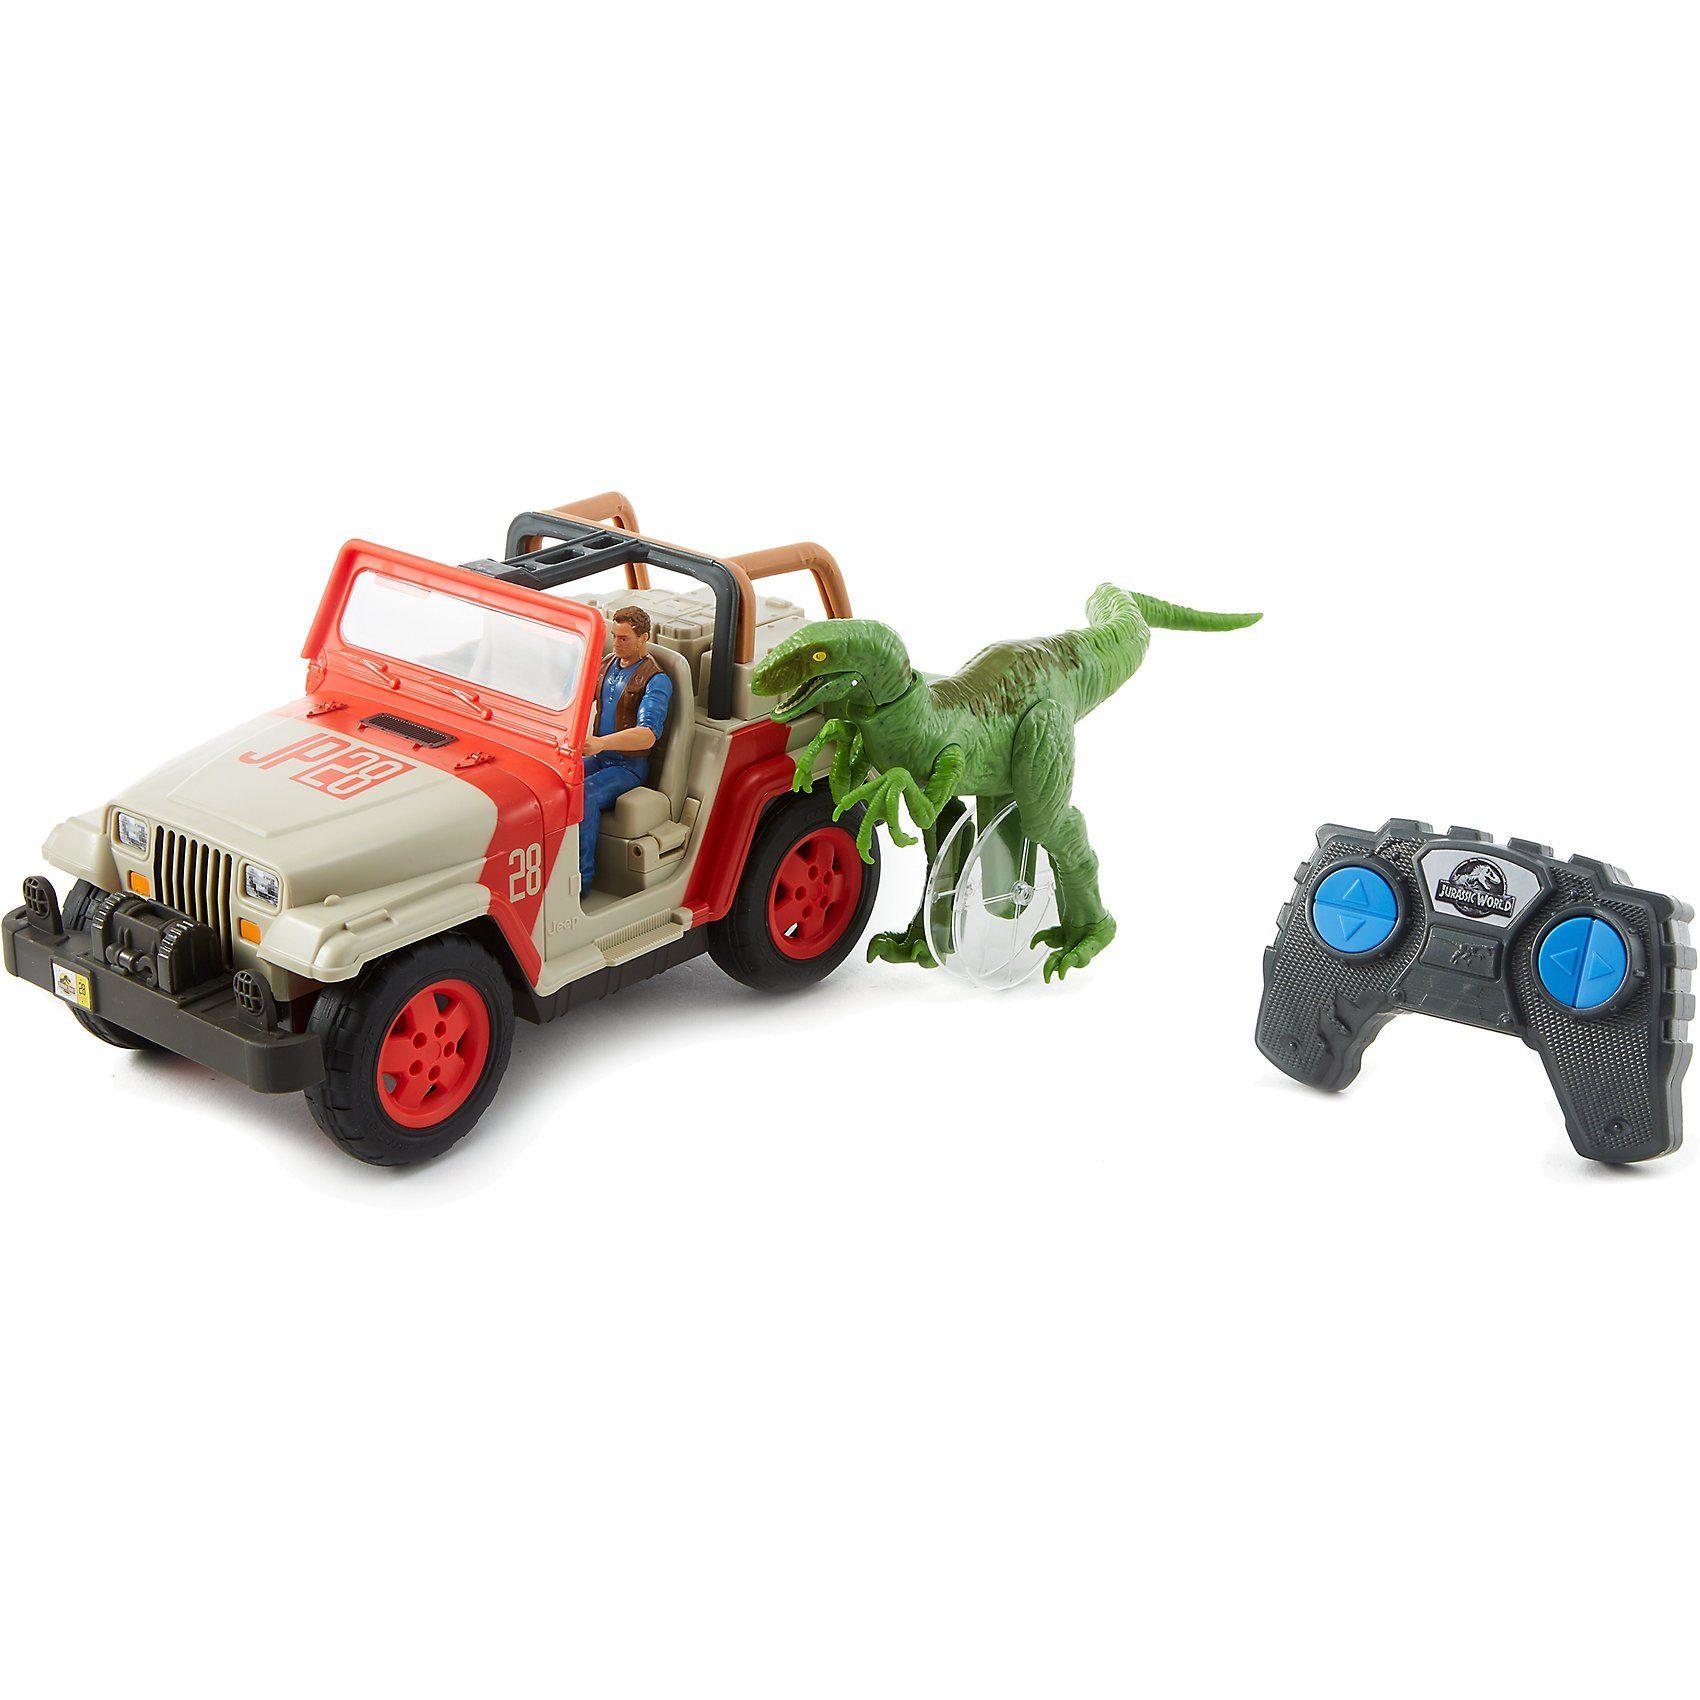 Mattel® Matchbox Jurassic World Jeep Wrangler Raptor Attack RC